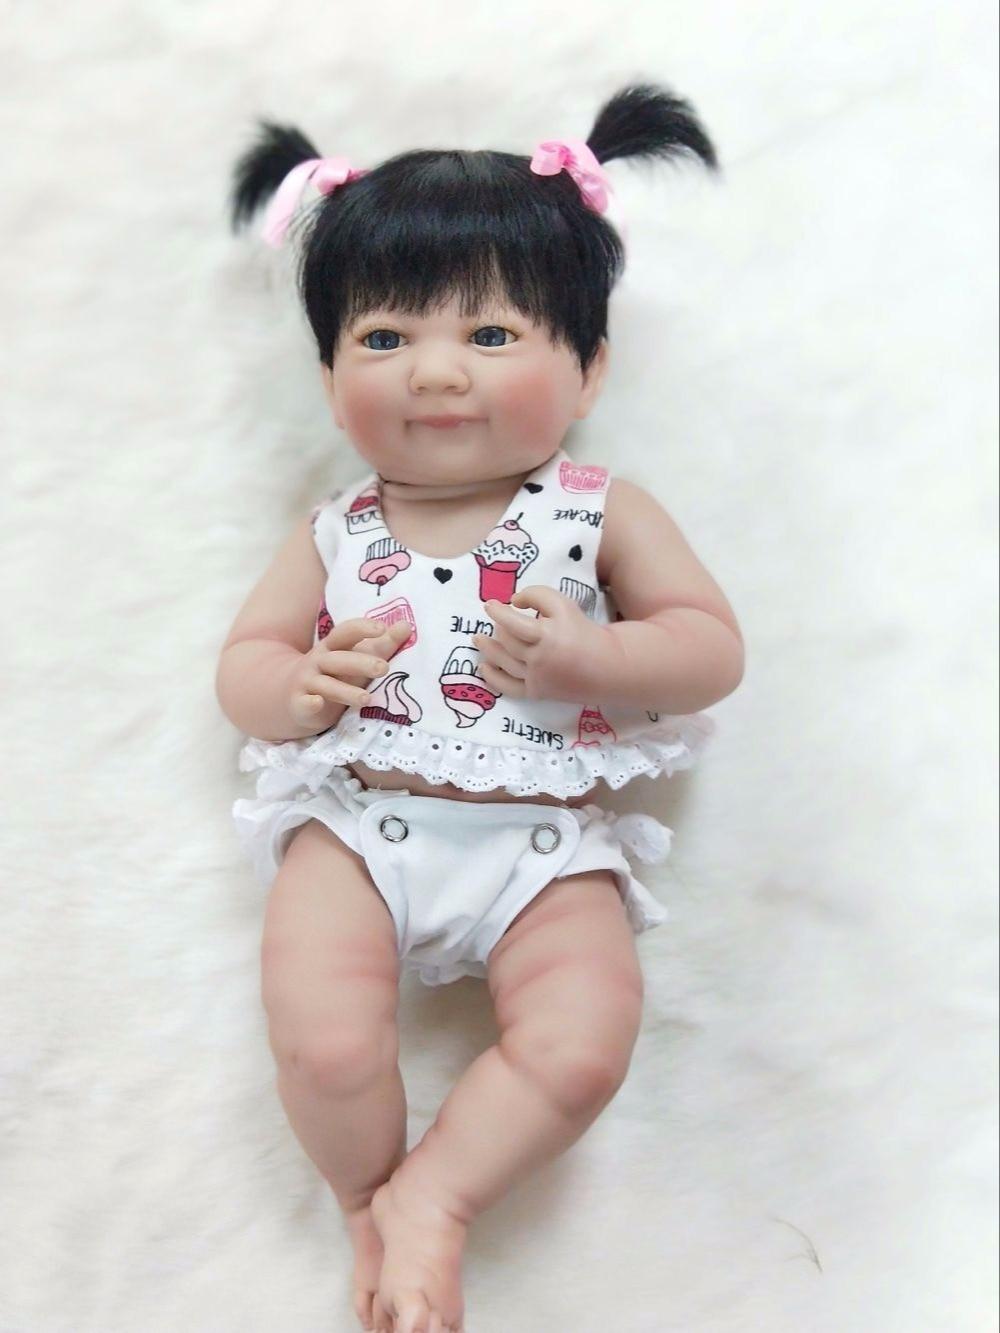 35cm Full Silicone Body Reborn Baby Doll Toys Lifelike 14inch Mini Vinyl Princess Girl Babies Doll Birthday Gift Bathe Toy